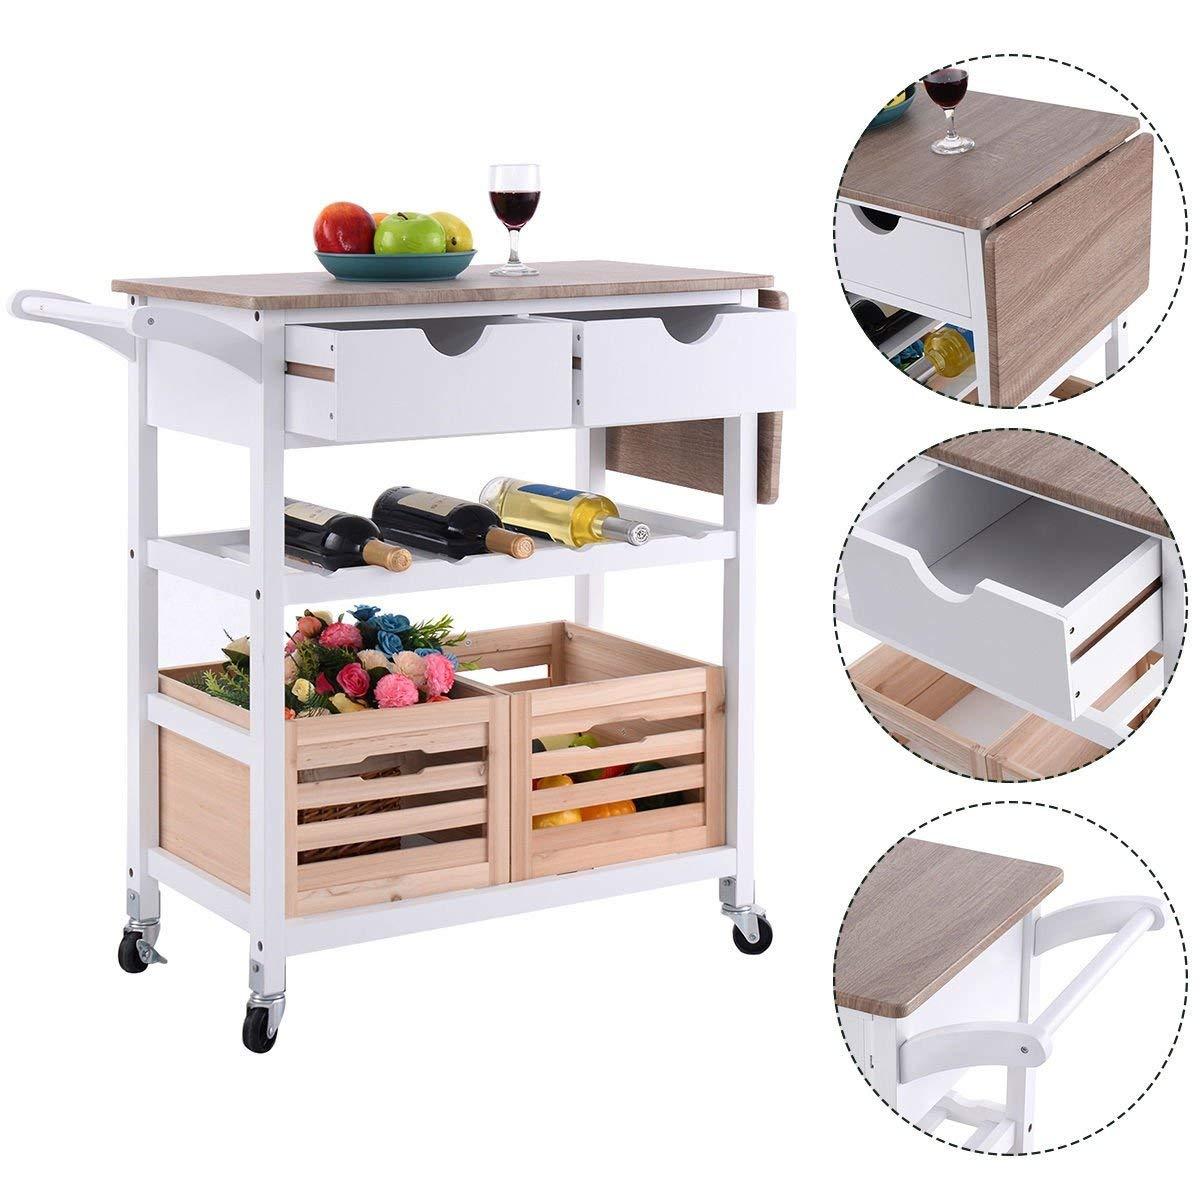 Costway Rolling Kitchen Trolley Island Cart Drop-leaf w/ Storage Drawer Basket Wine Rack